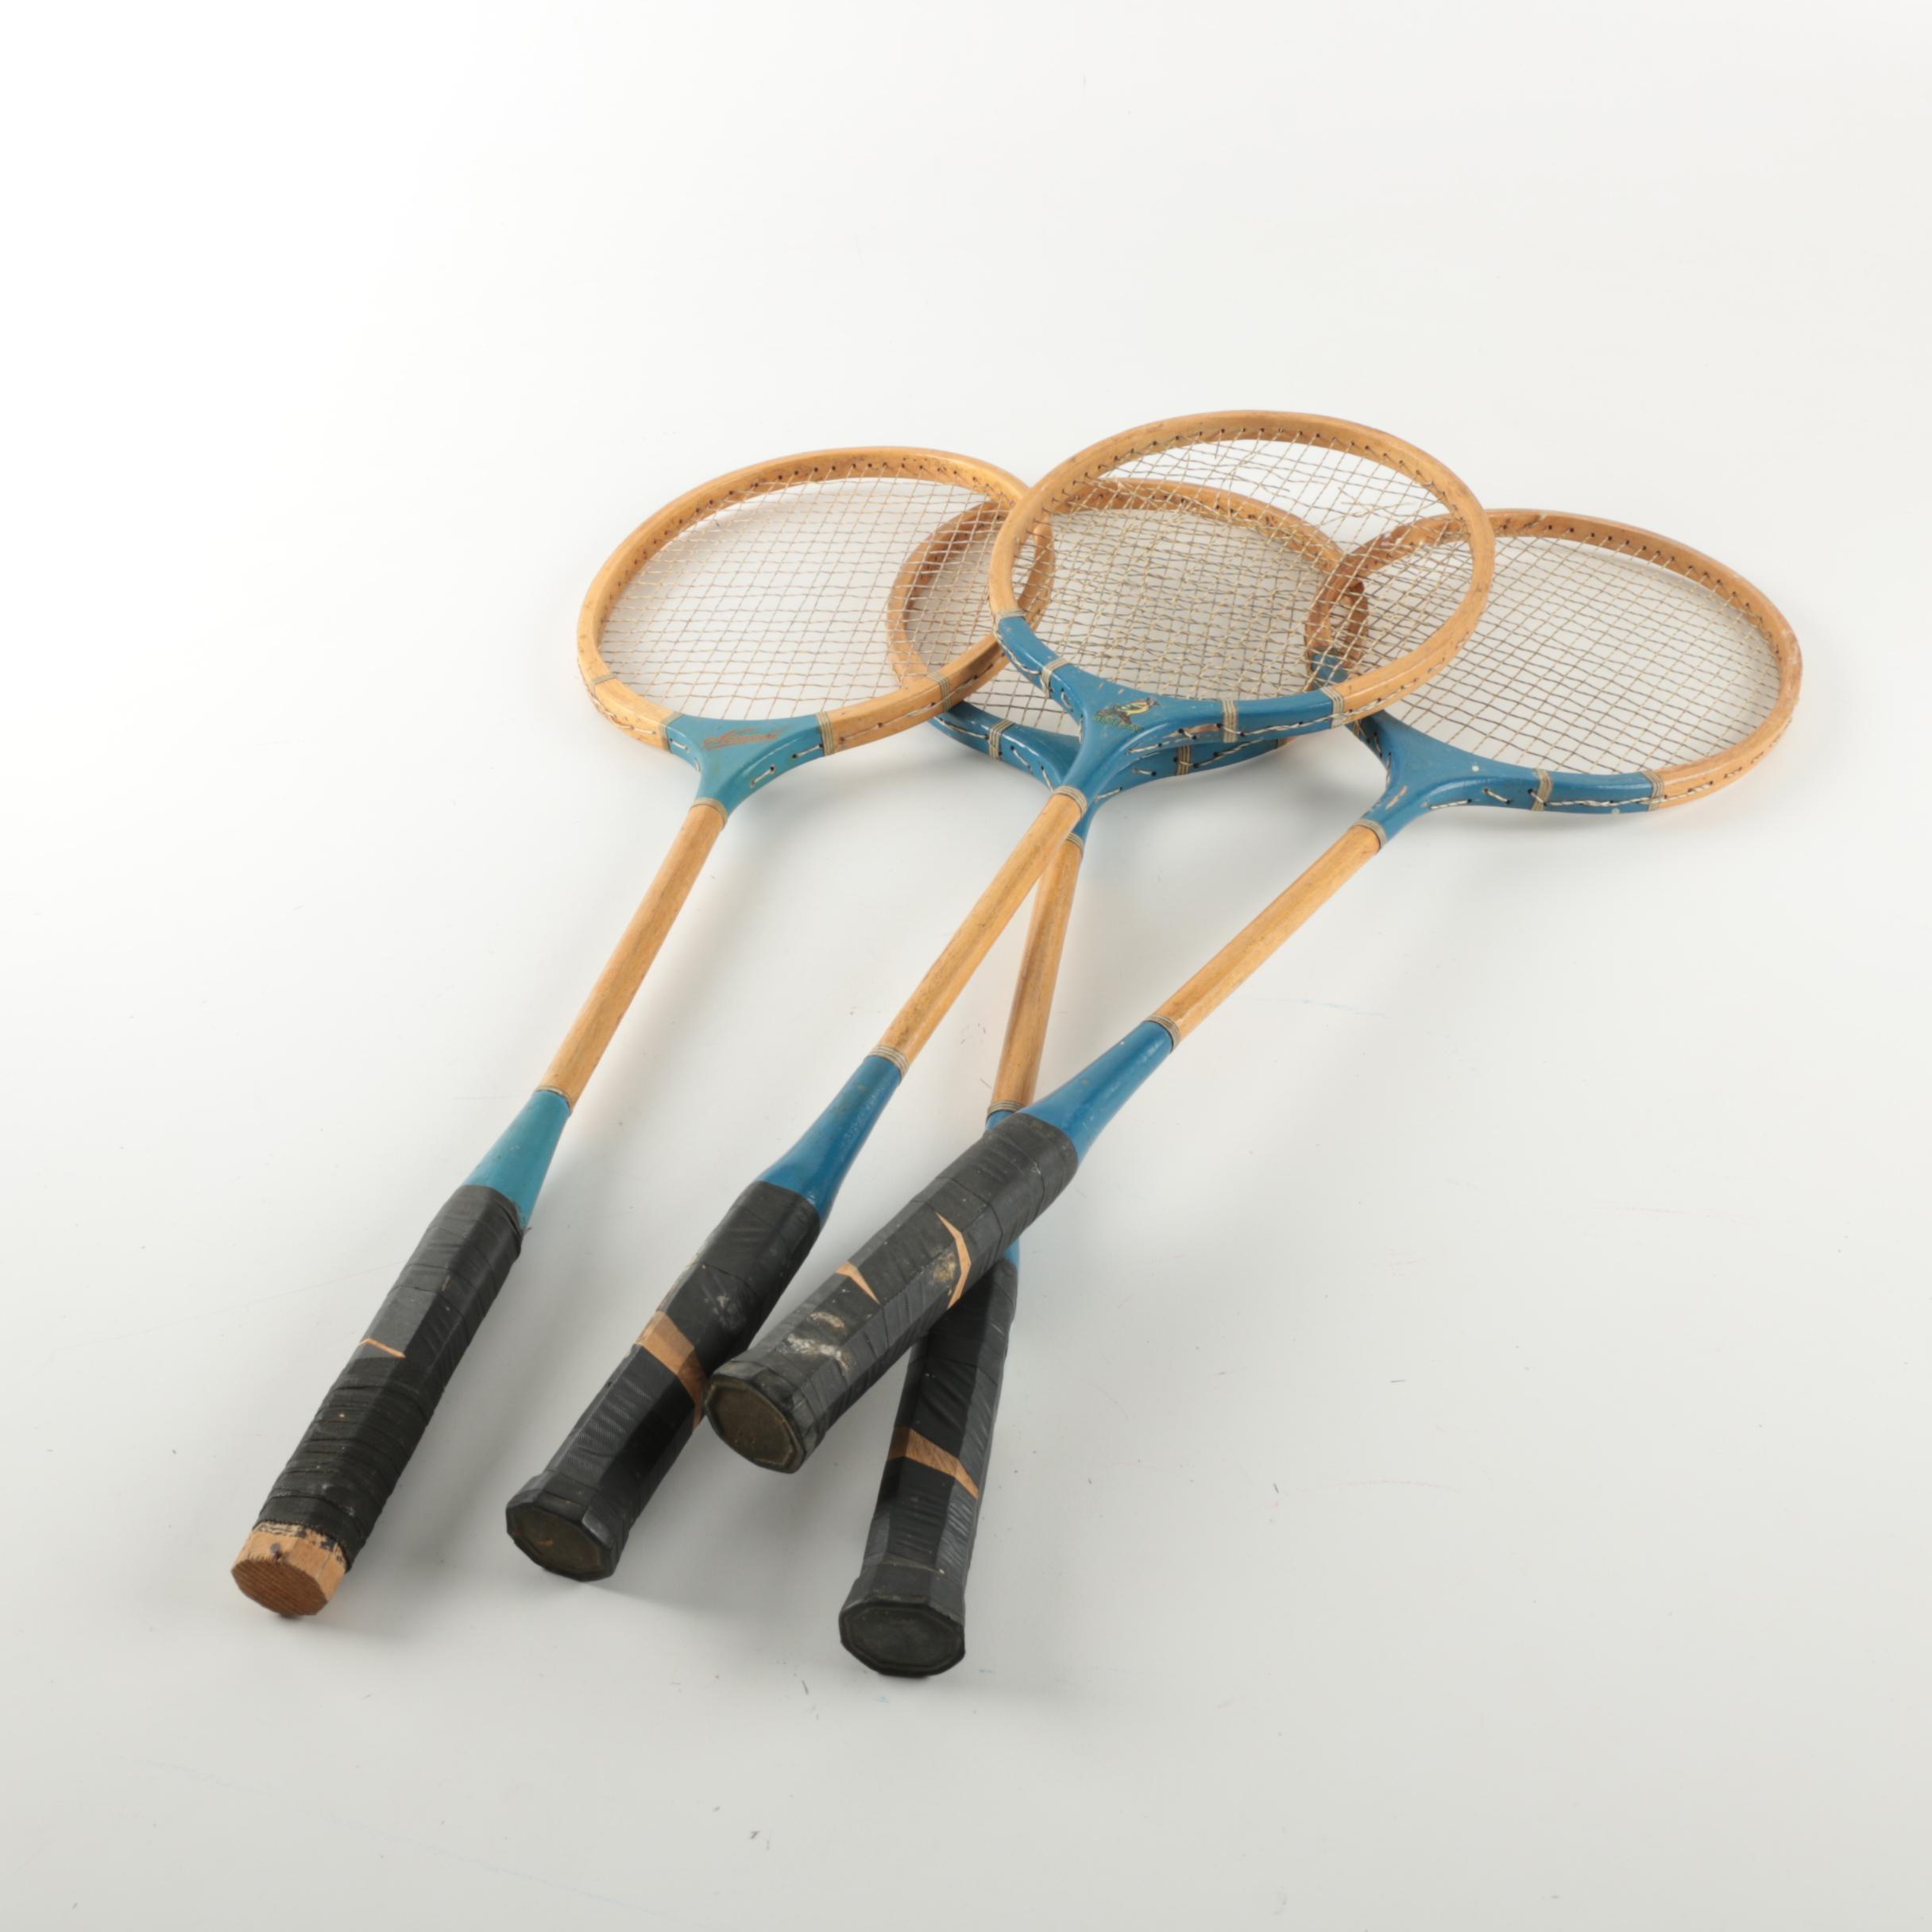 Four Vintage Badminton Rackets